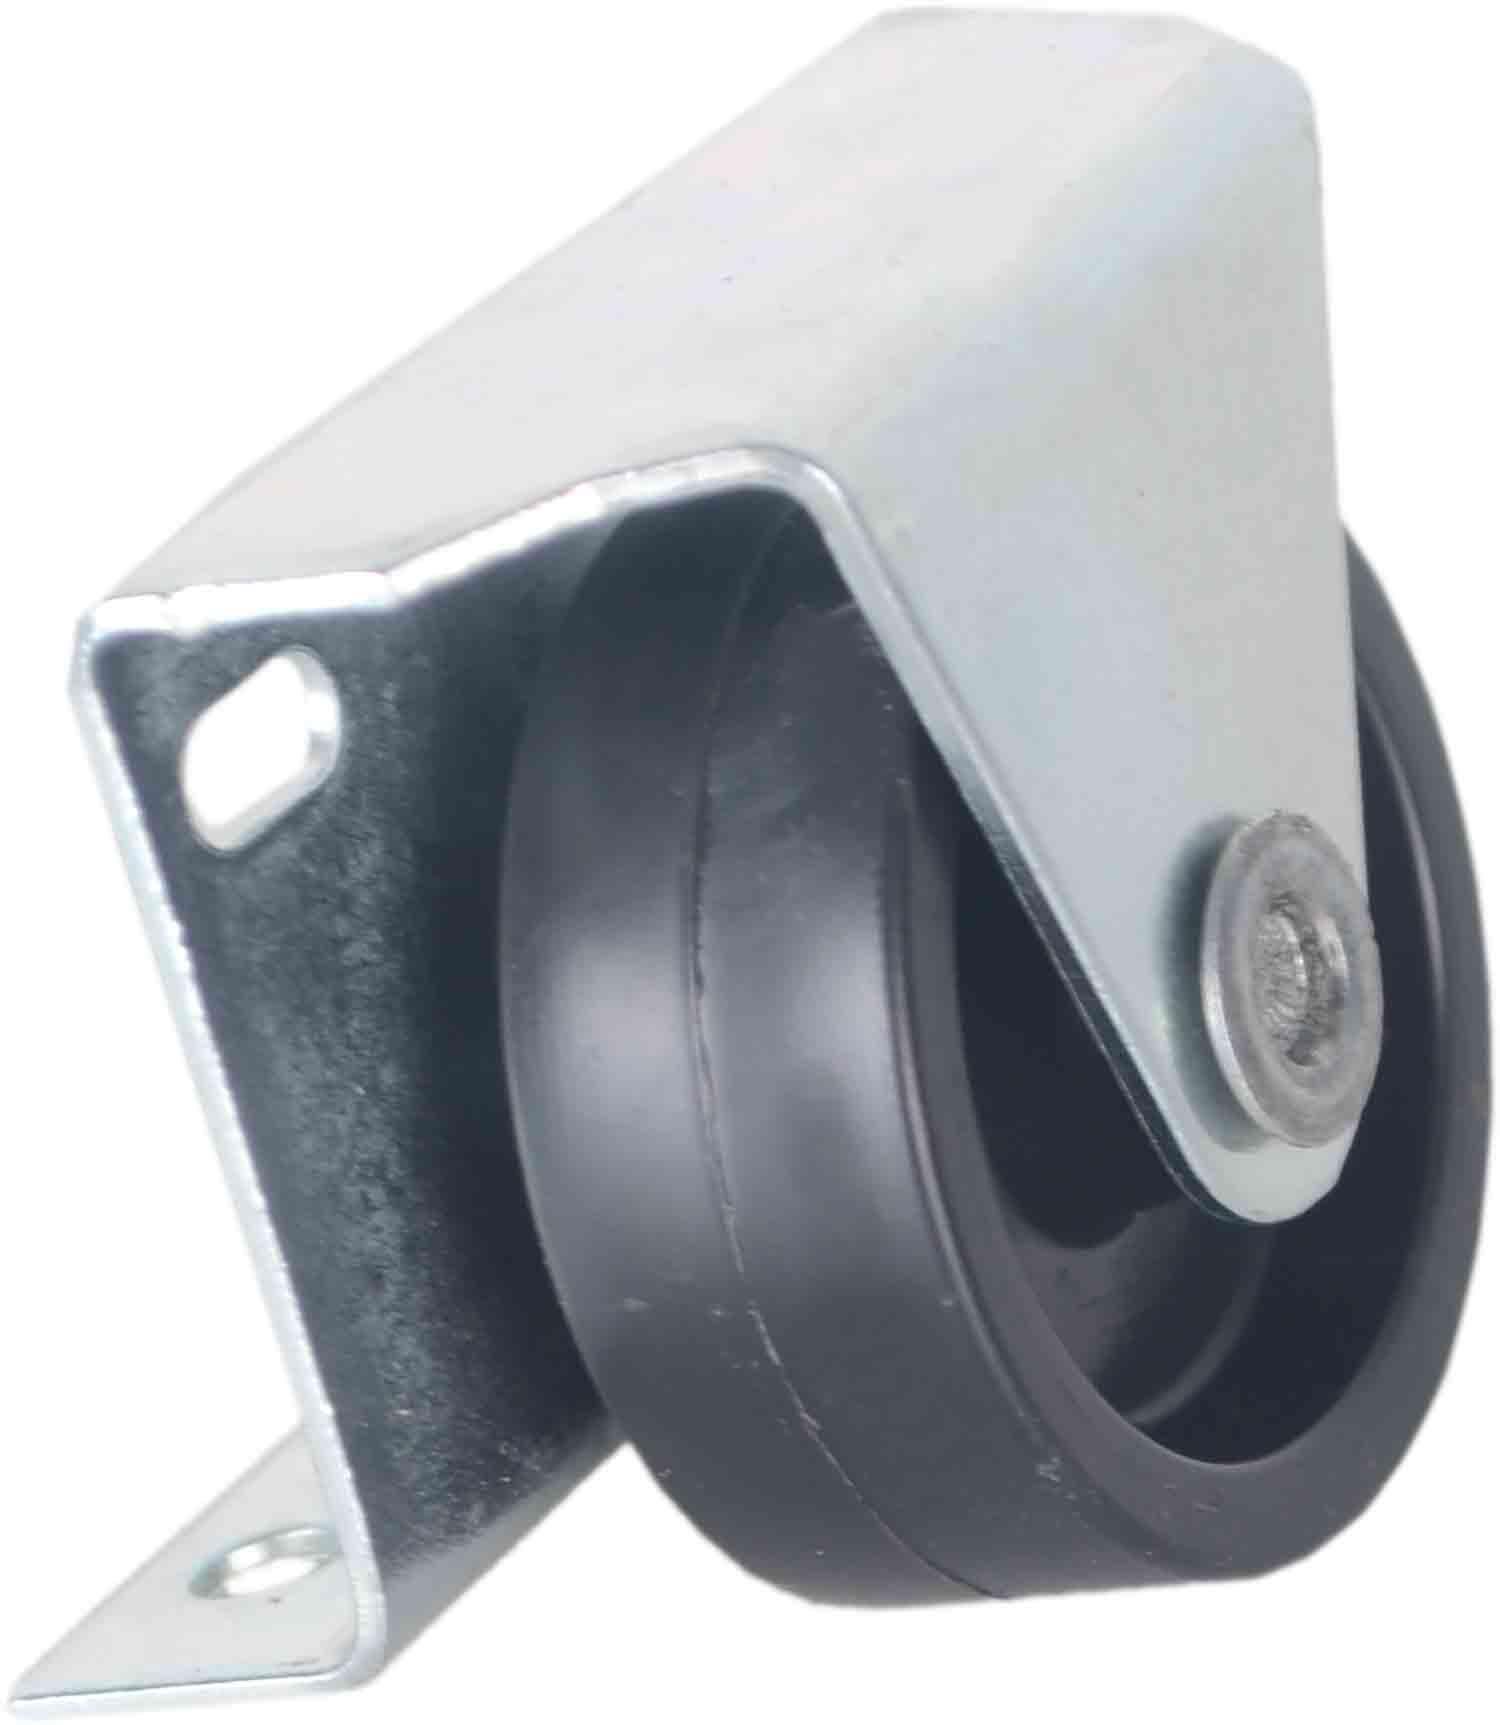 50 Roda Rodízio Fixo Chapa L 36mm 50kg (Cama auxiliar)